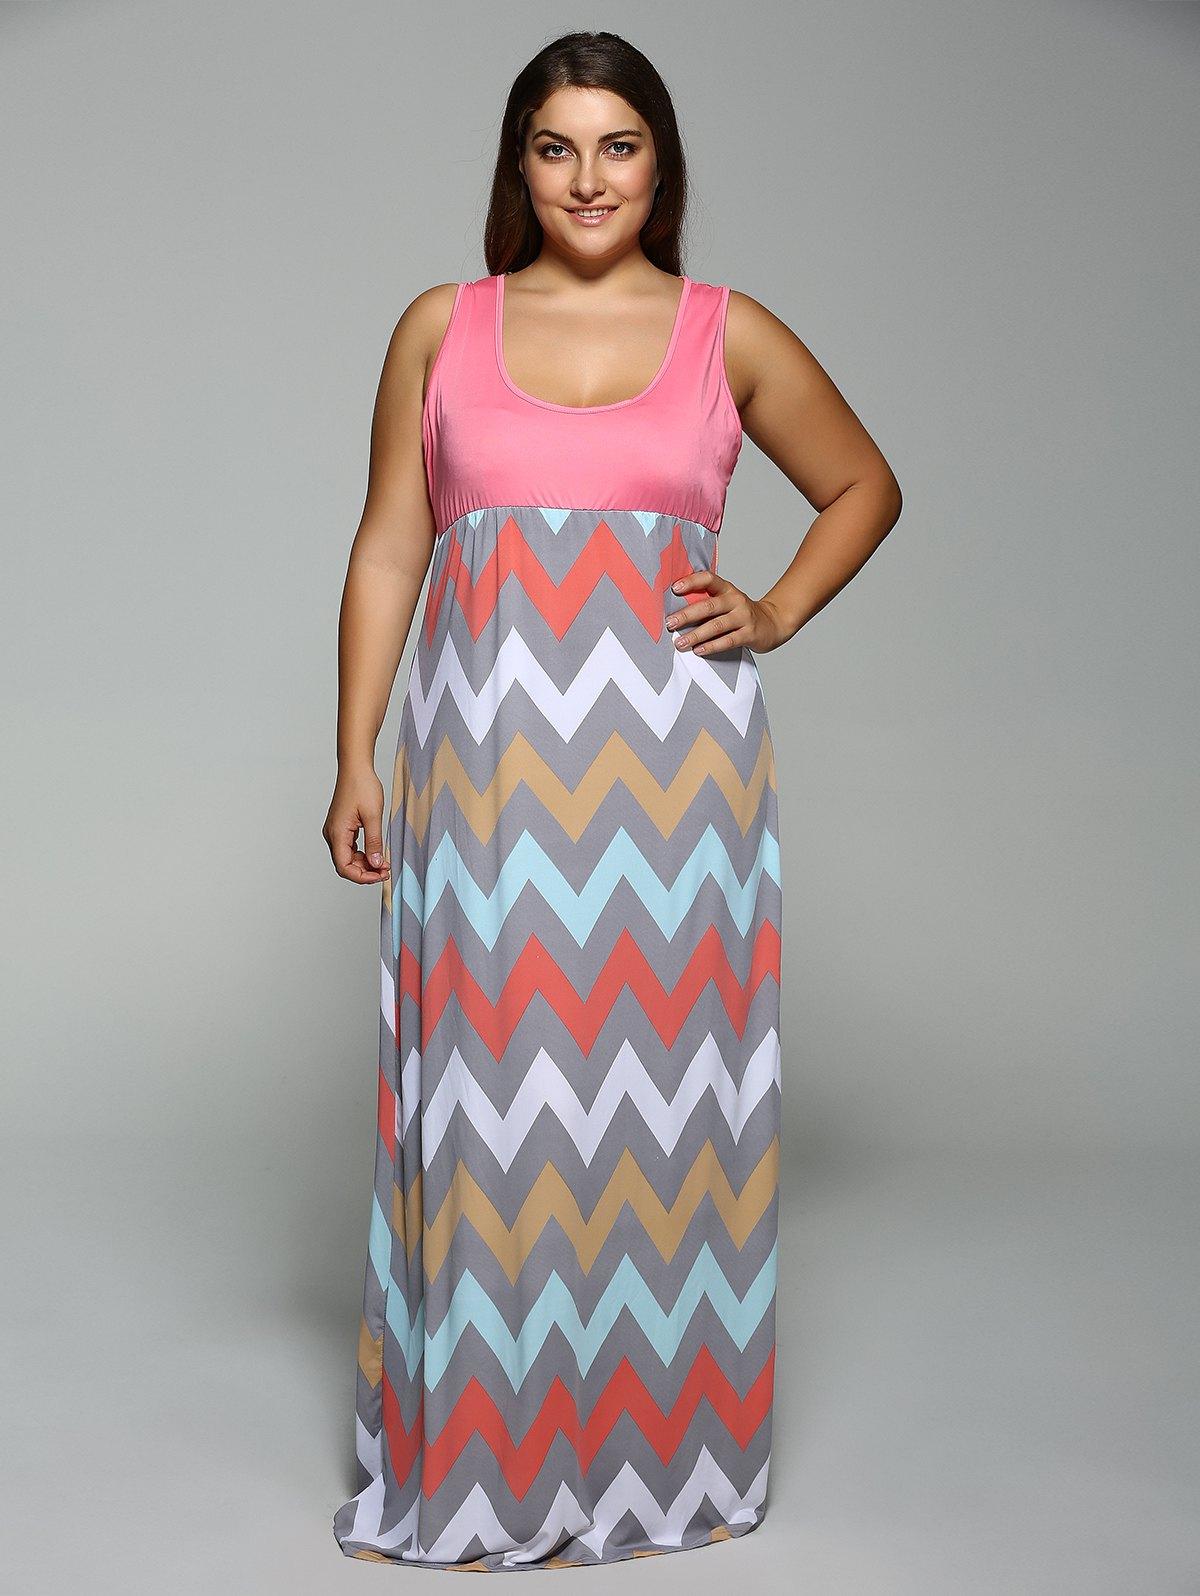 662874bab5abd Summer Pink Empire Waist Zig Zag Plus Size Dress FREE DELIVERY